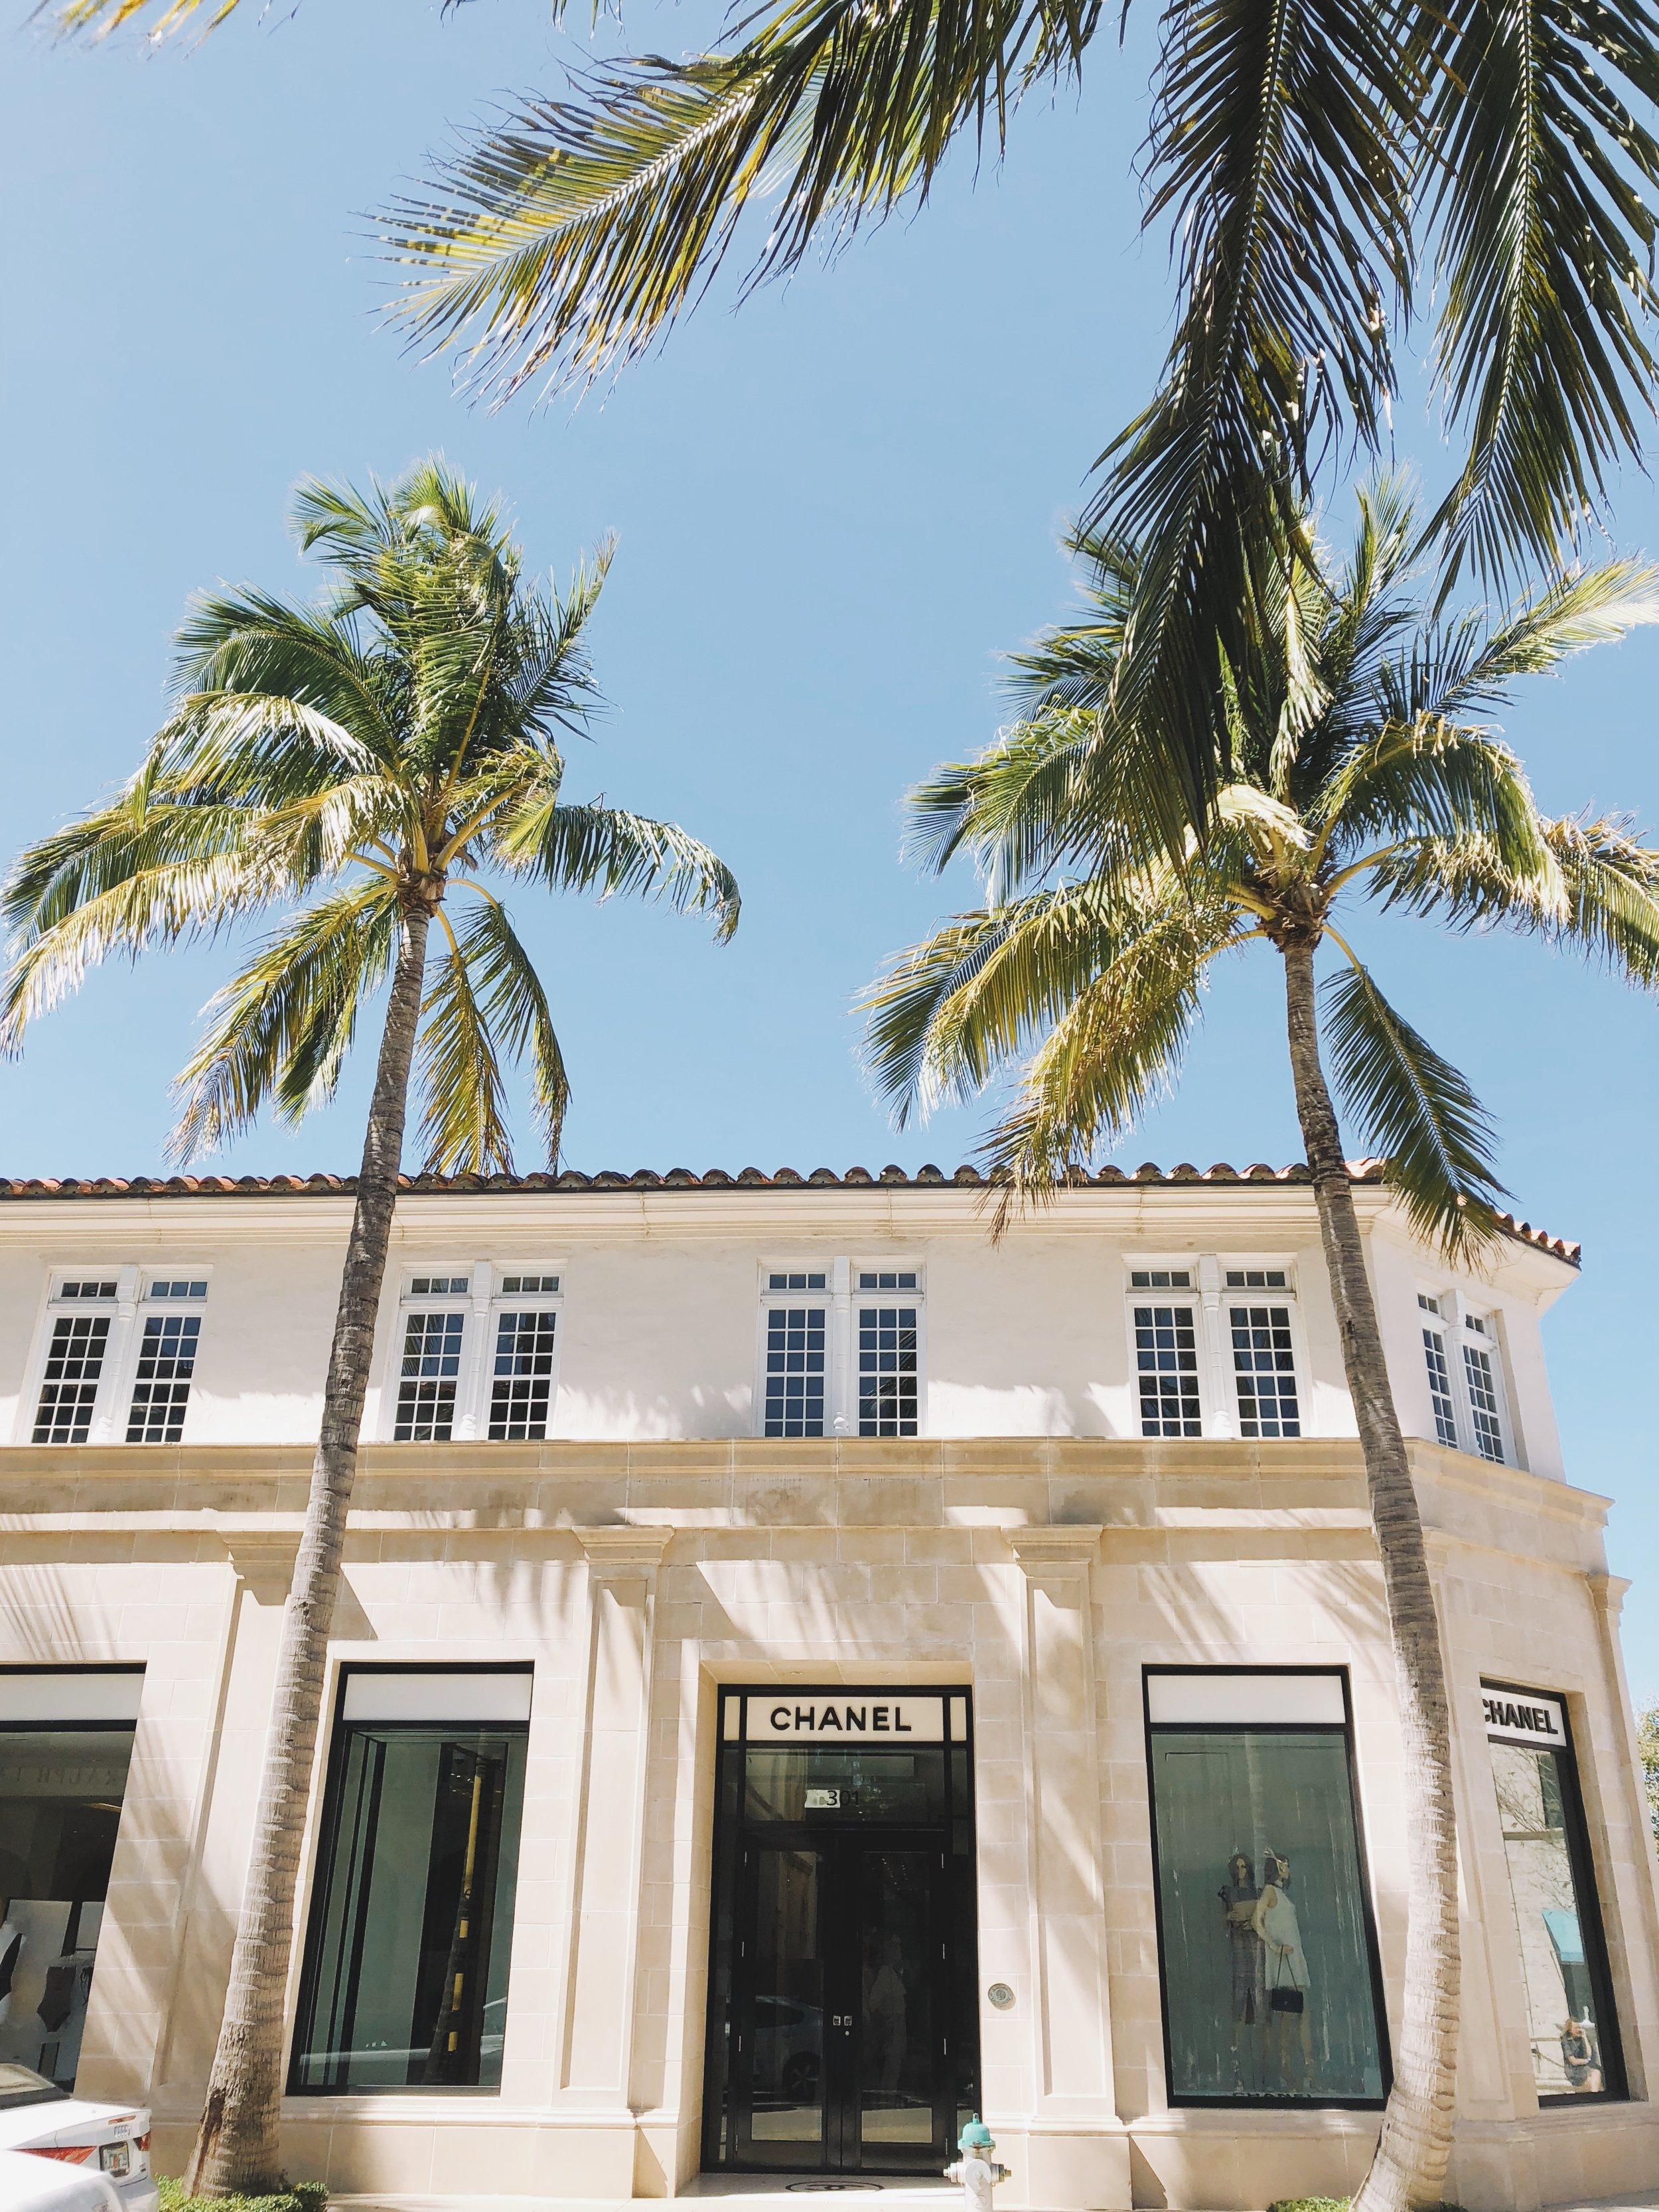 On Worth Avenue | Photo by Kira Semple | KiraSemple.com